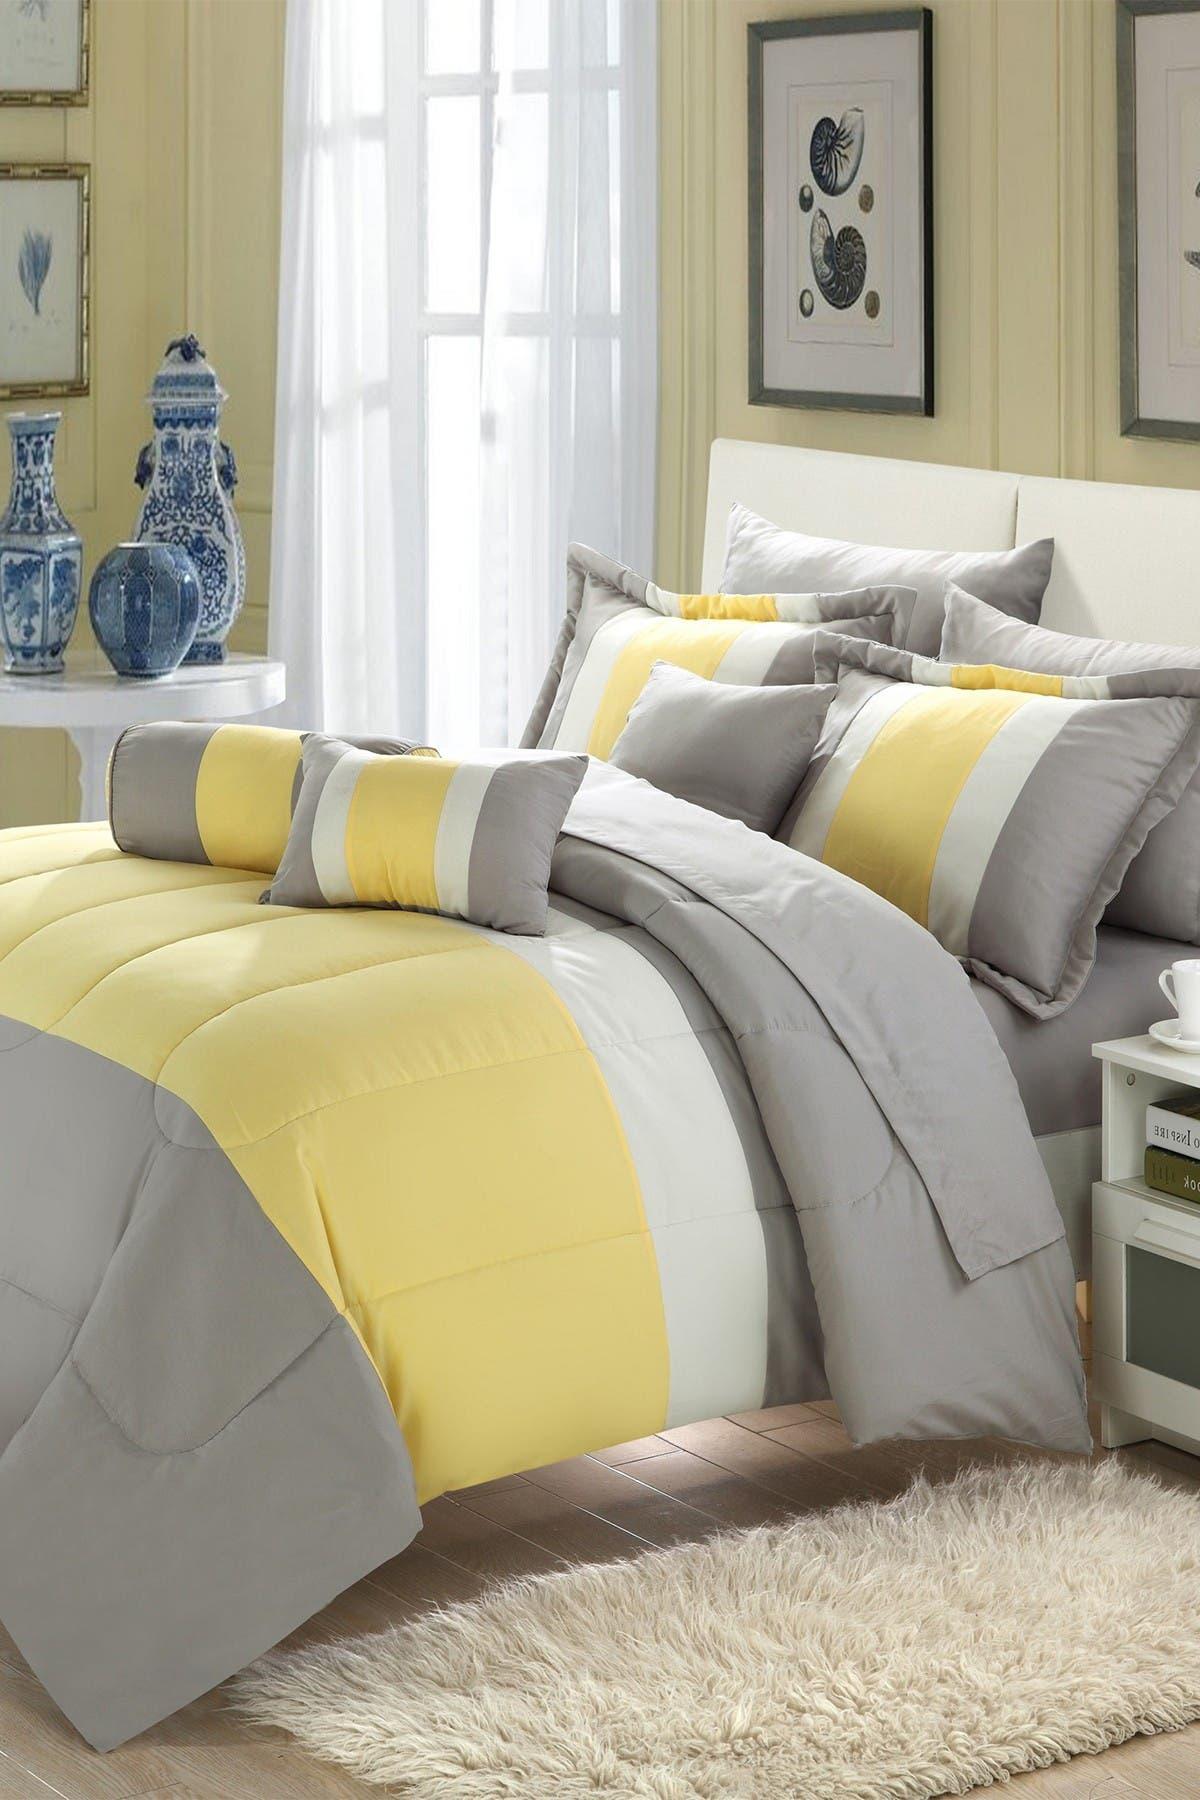 Image of Chic Home Bedding King Sebastian Comforter 10-Piece Set - Yellow